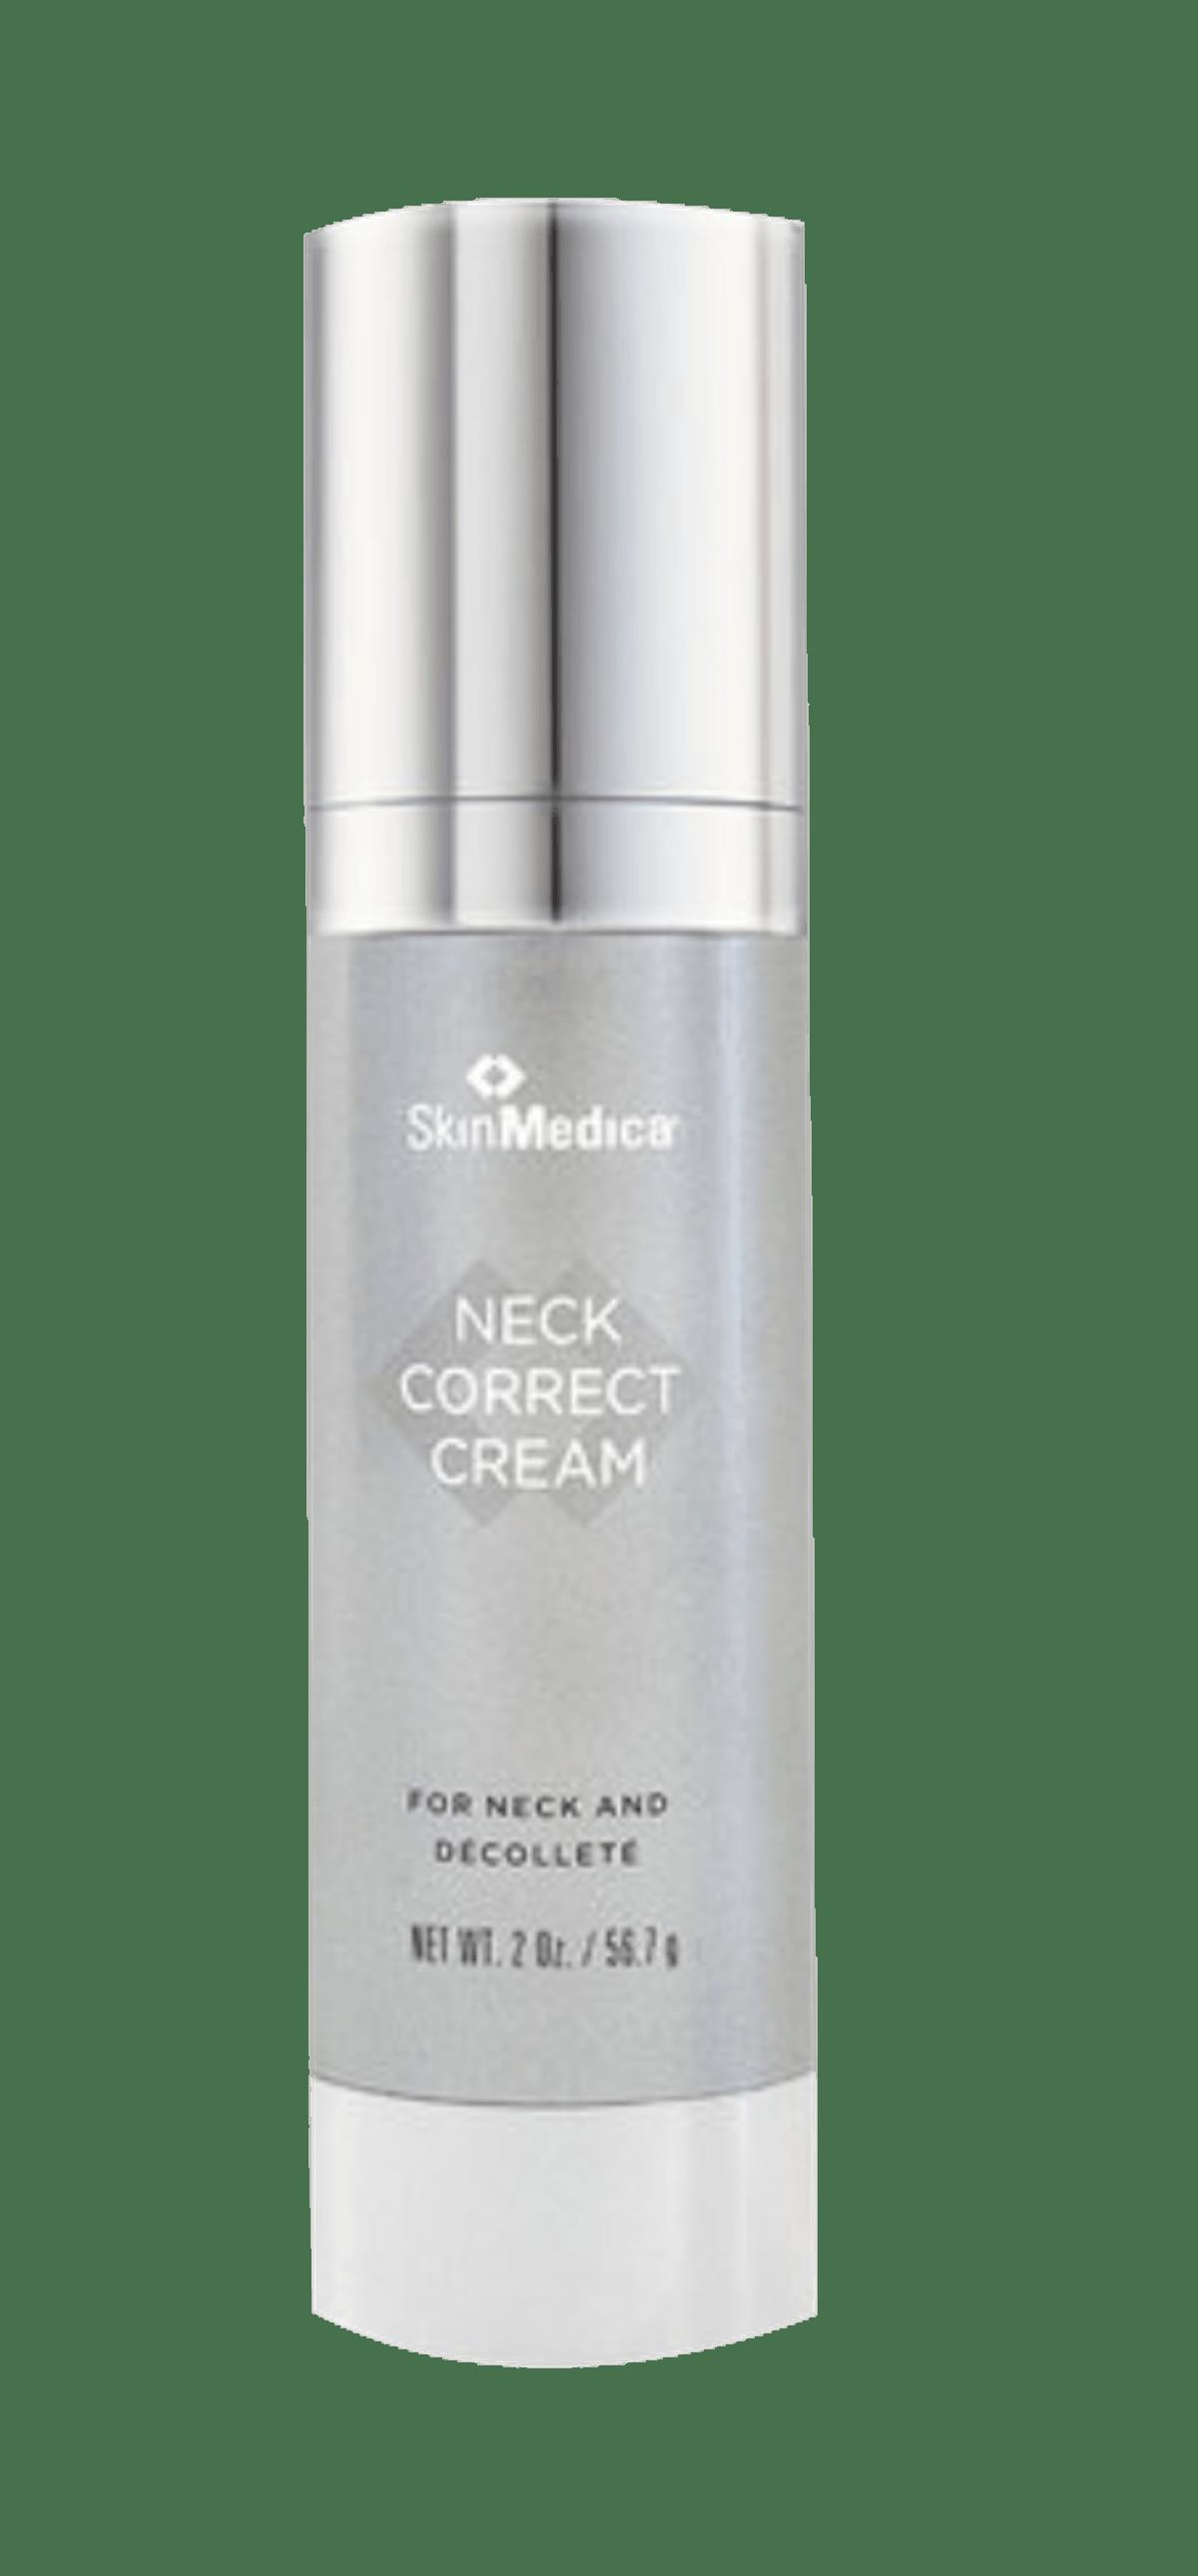 Neck Correct Cream